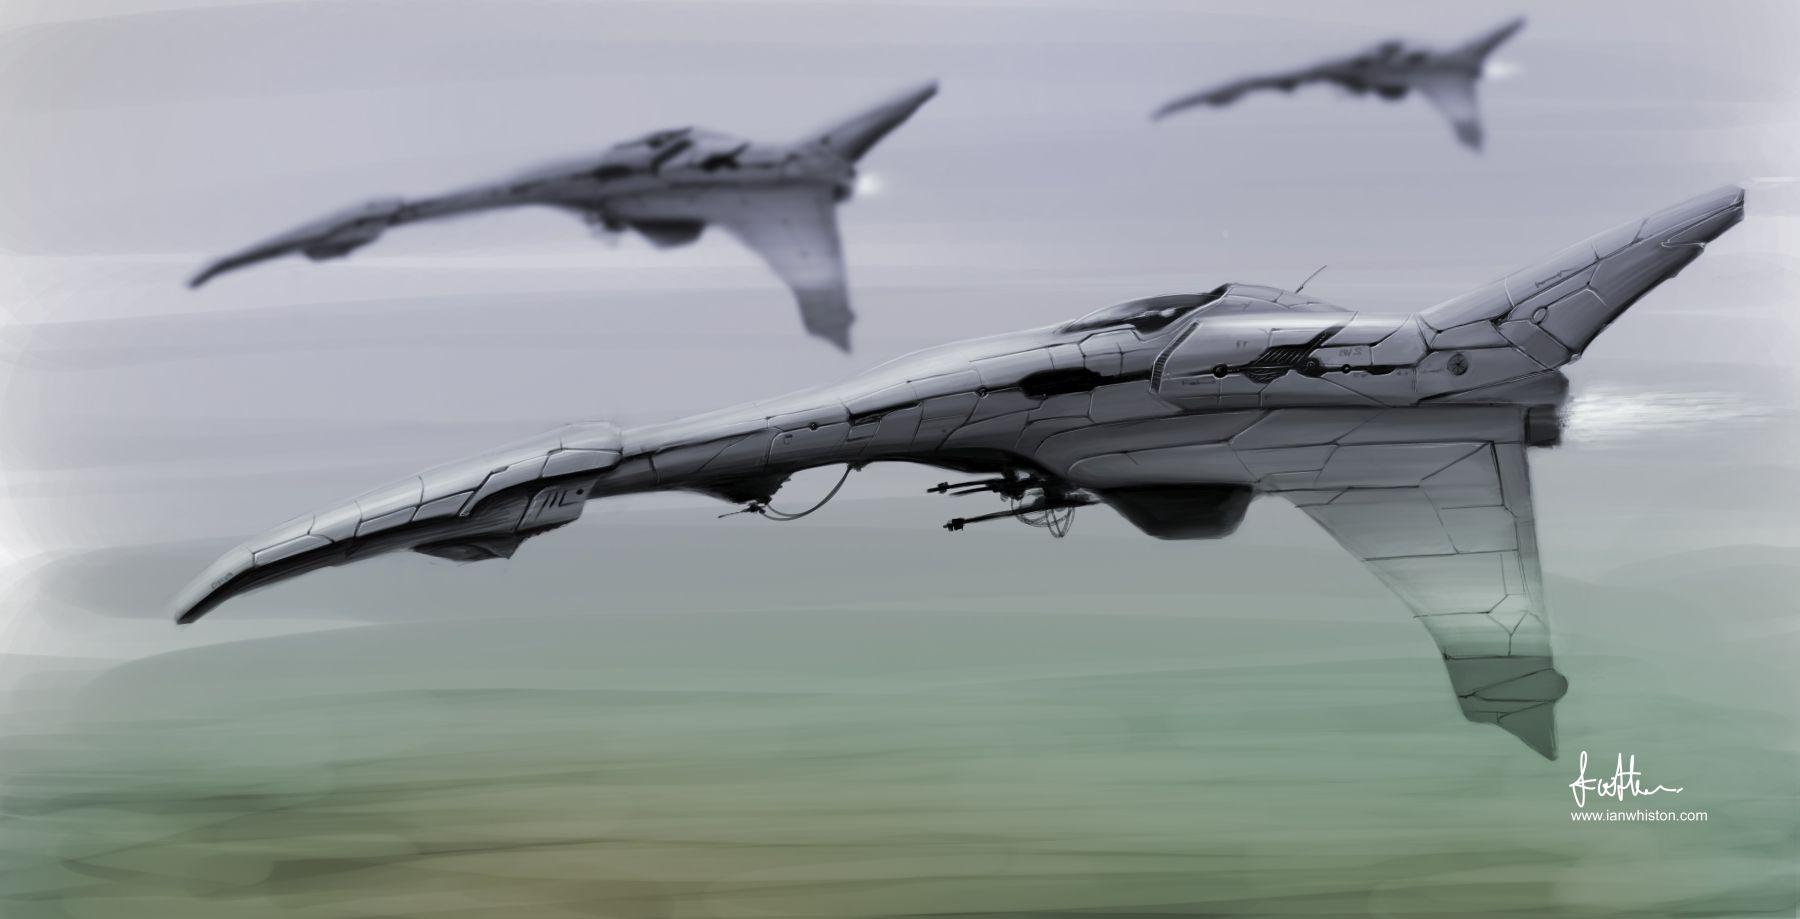 Of Infinite Worlds - Alien Fighter concept